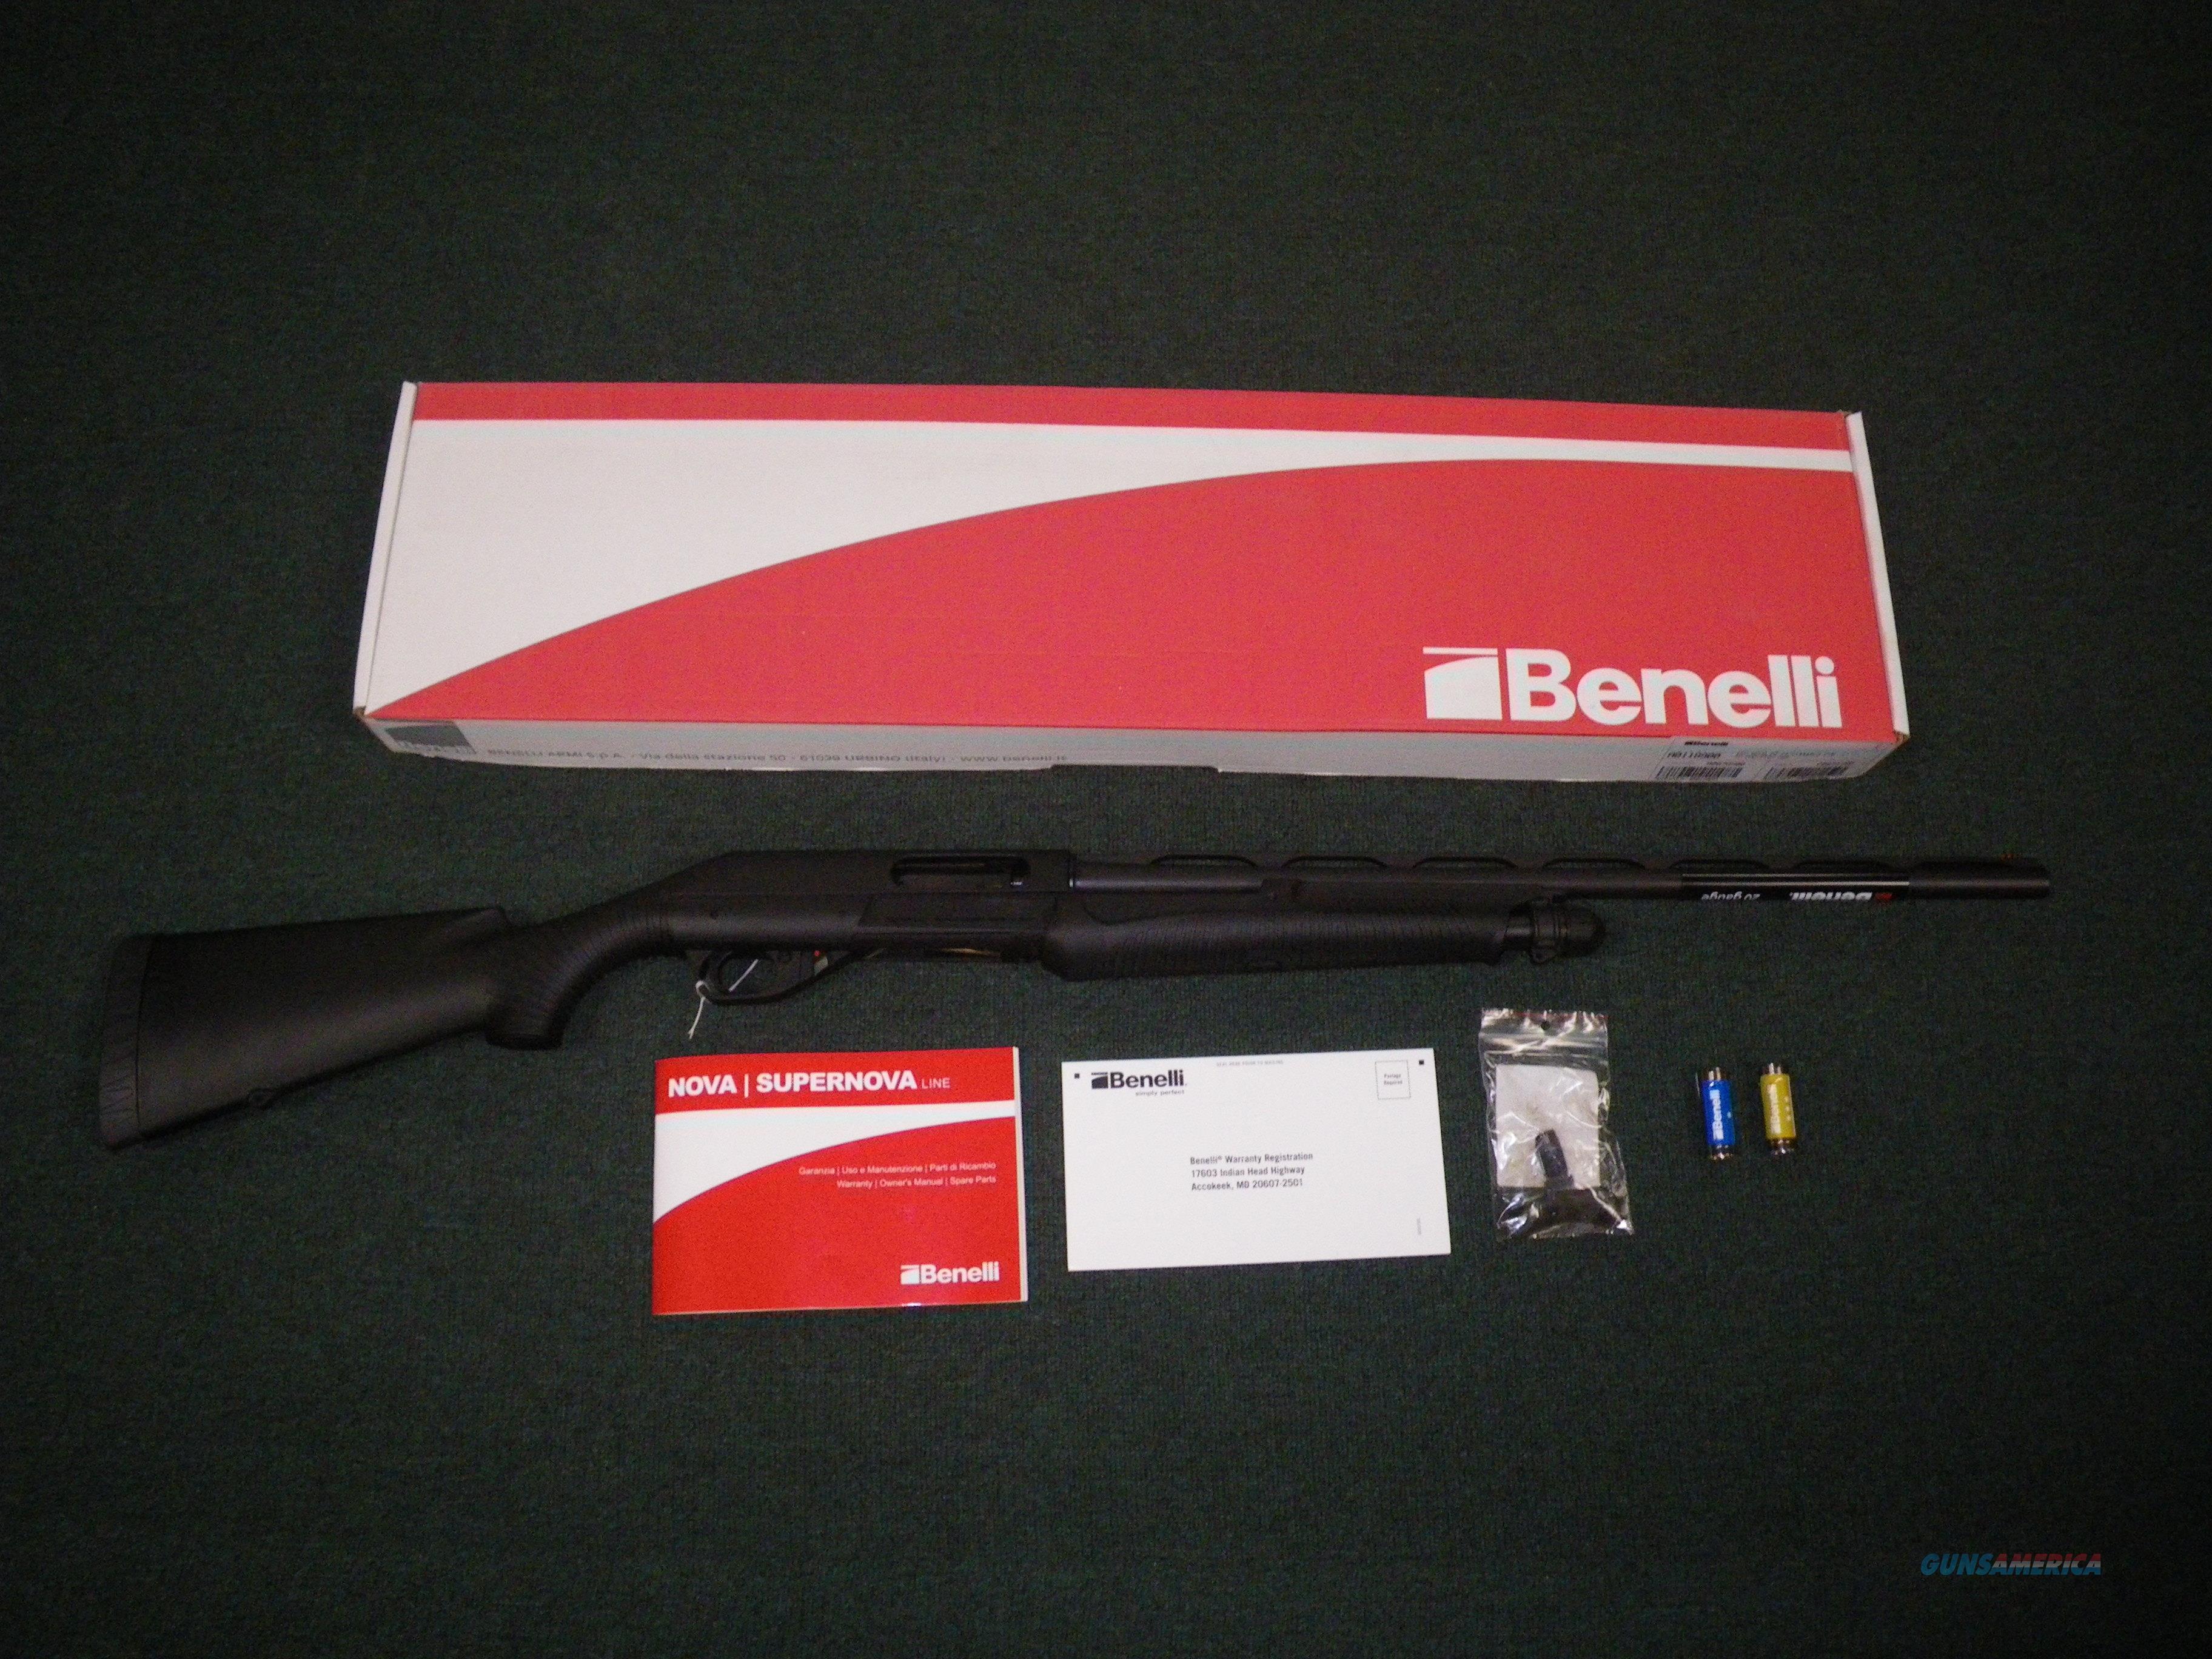 "Benelli Nova Pump Field Shotgun 12ga 26"" 3"" Chmbr #20003  Guns > Shotguns > Benelli Shotguns > Sporting"